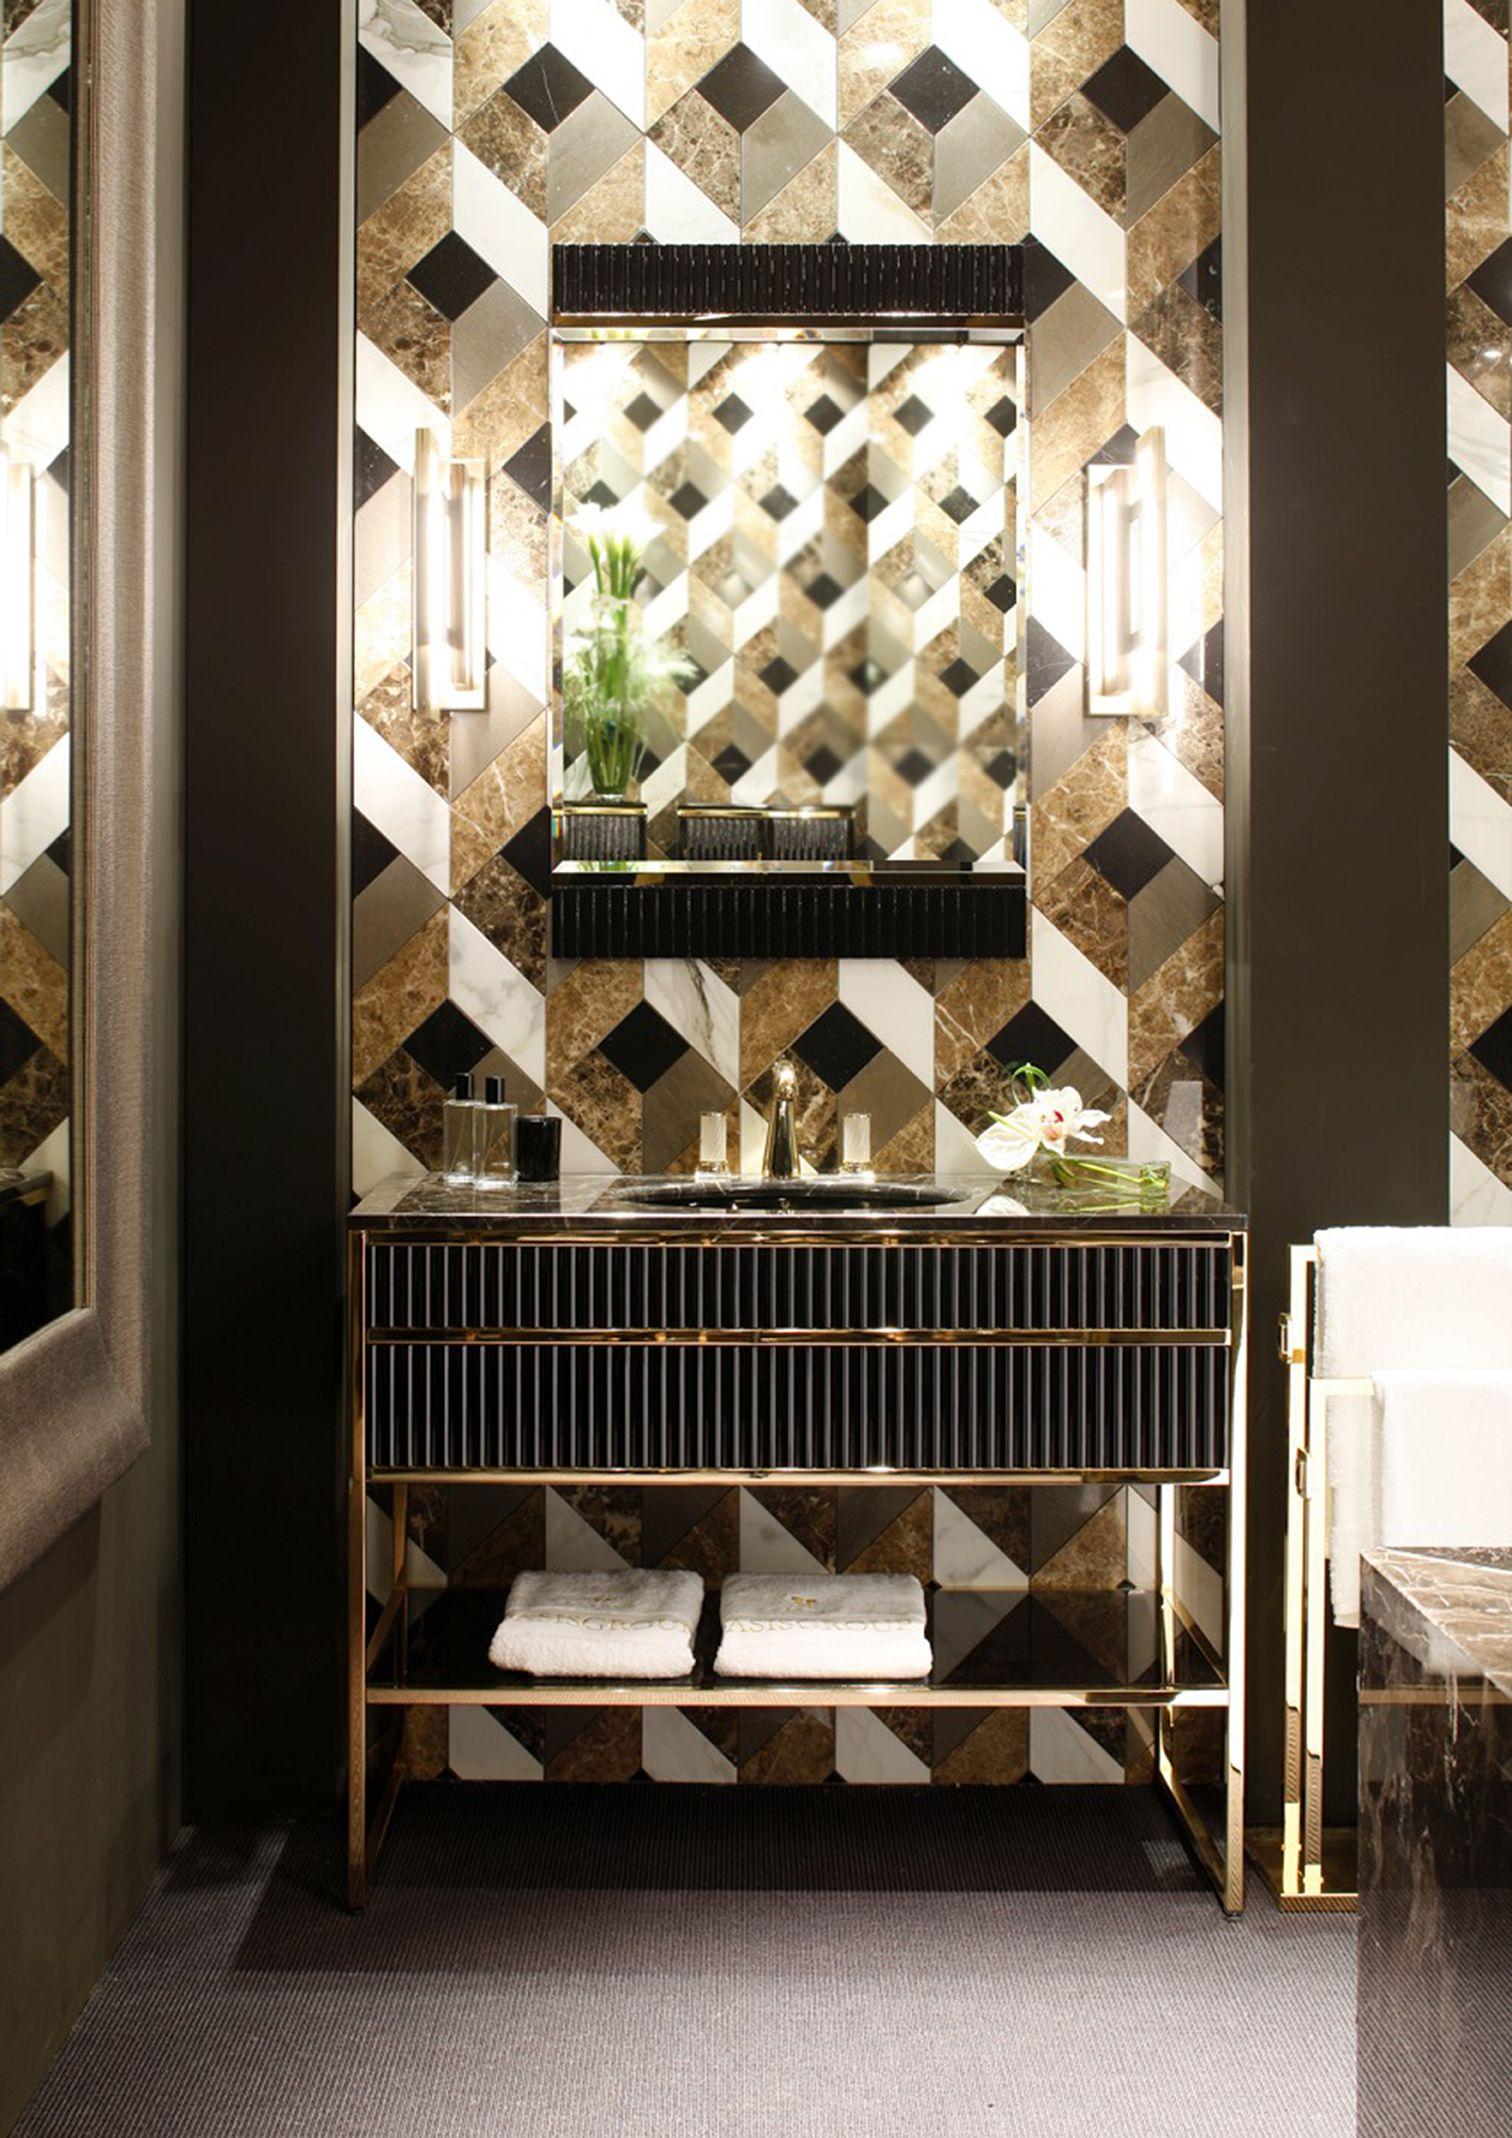 Luxury Bathroom Designs on 2015 small bathroom designs, 2015 luxury bedroom interior design, 2015 modern kitchen designs,